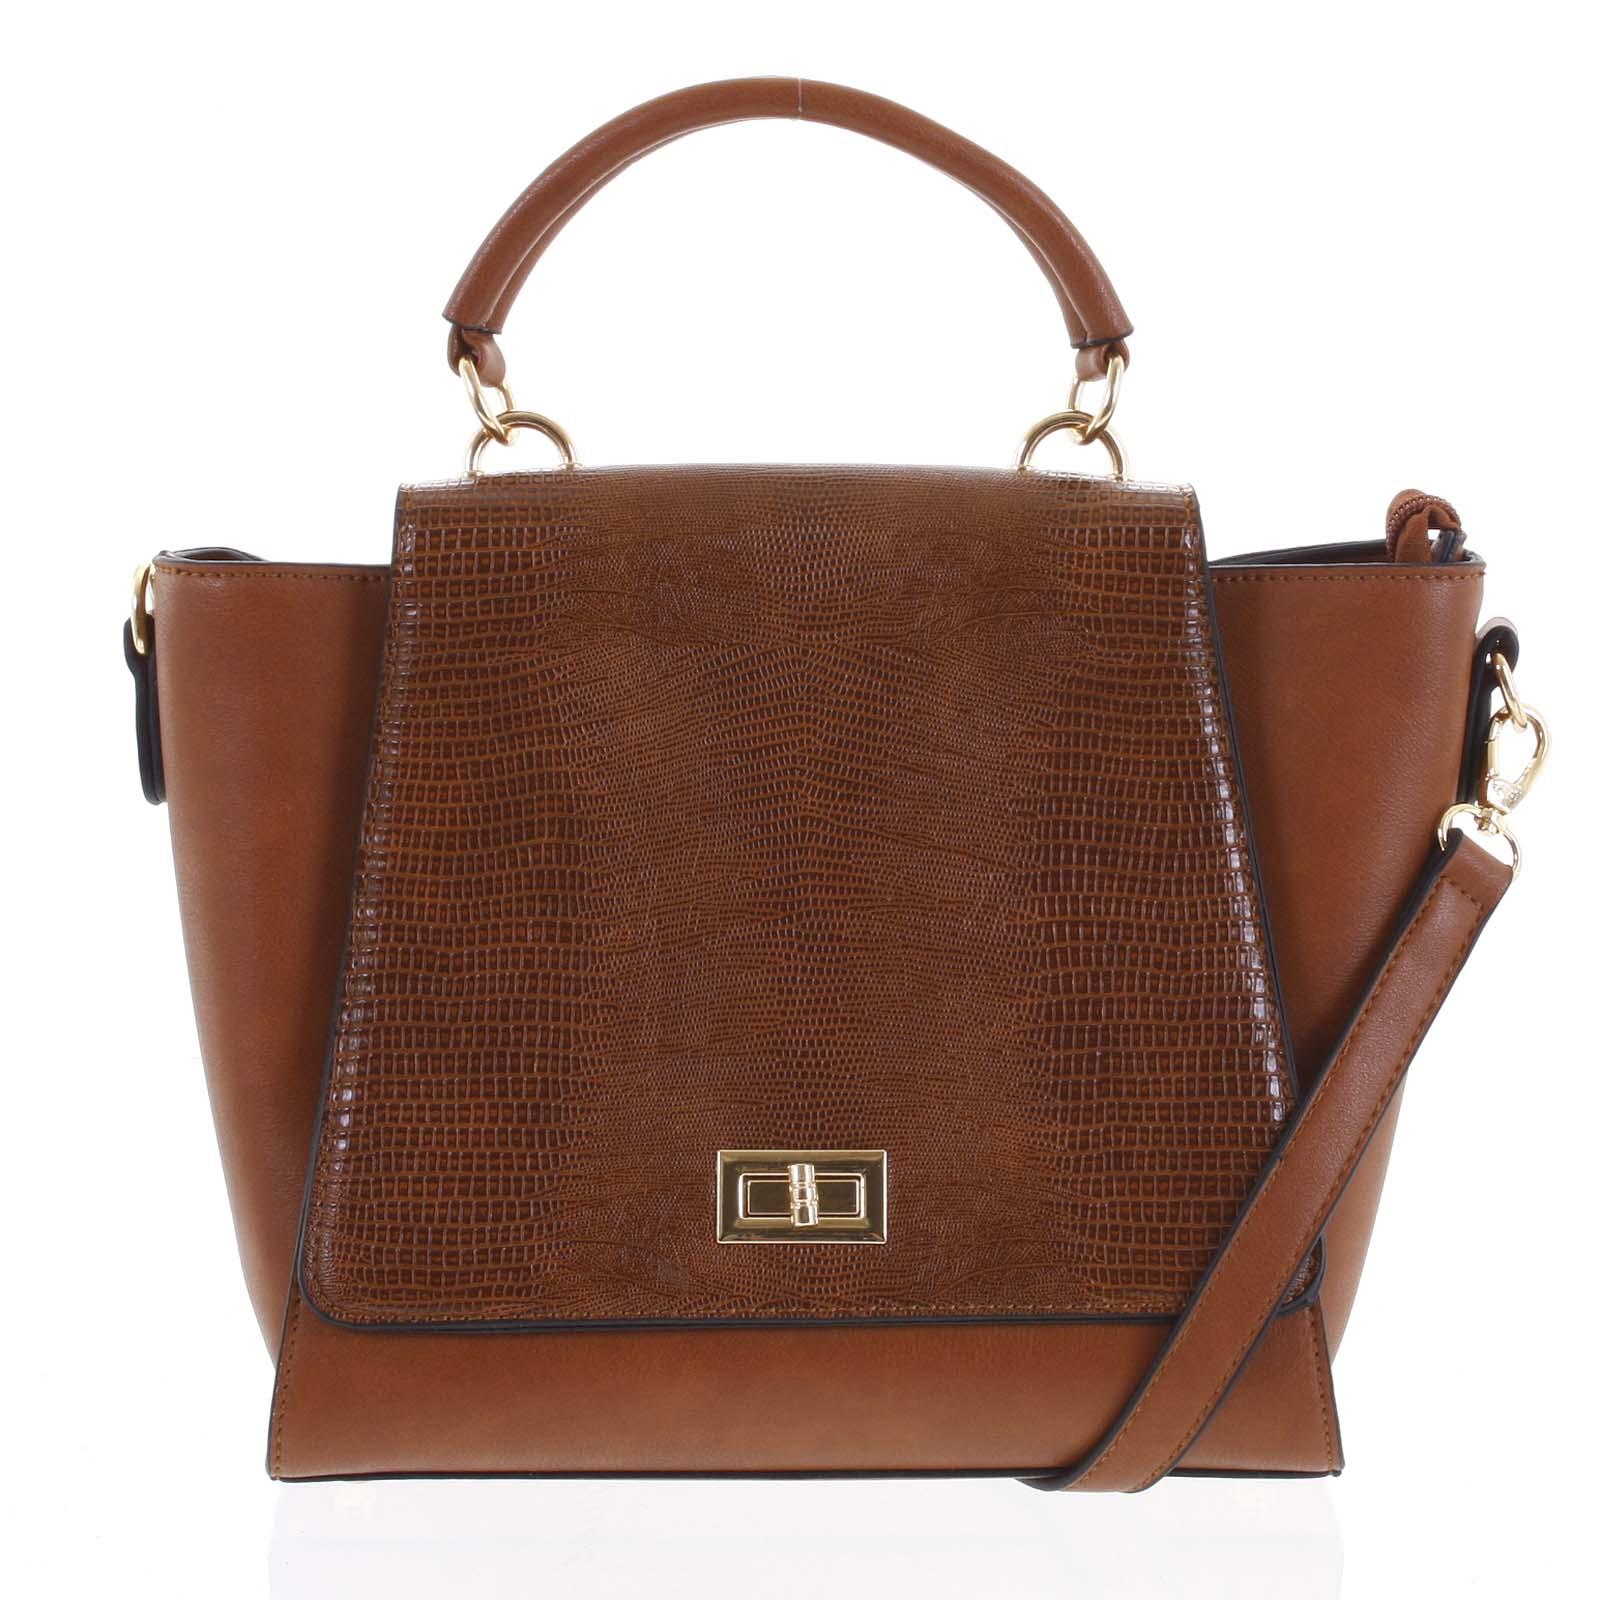 Dámska kabelka do ruky svetlo hnedá - Dudlin Mirla hnedá